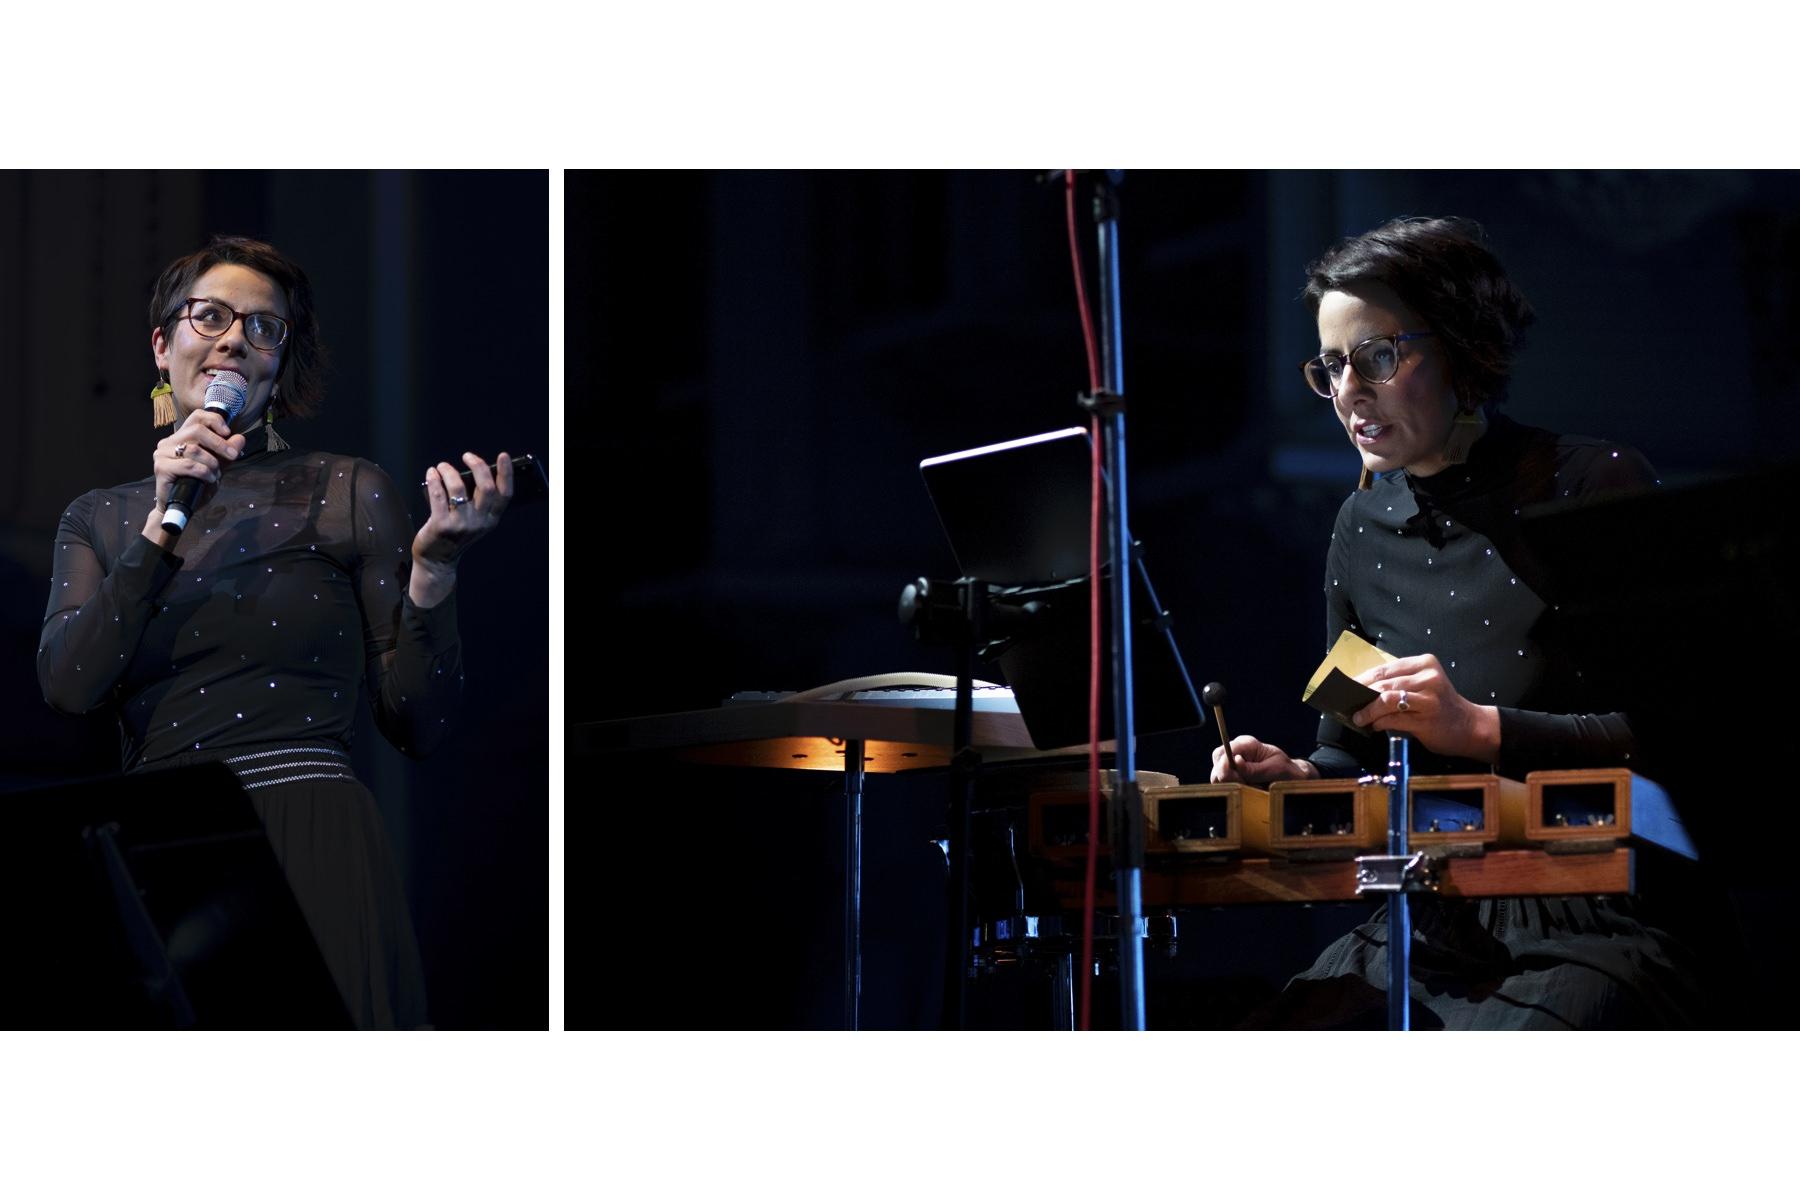 Ensemble Offspring - Kontiki Racket, 2019 Photography by Christopher Hayles-0005.jpg